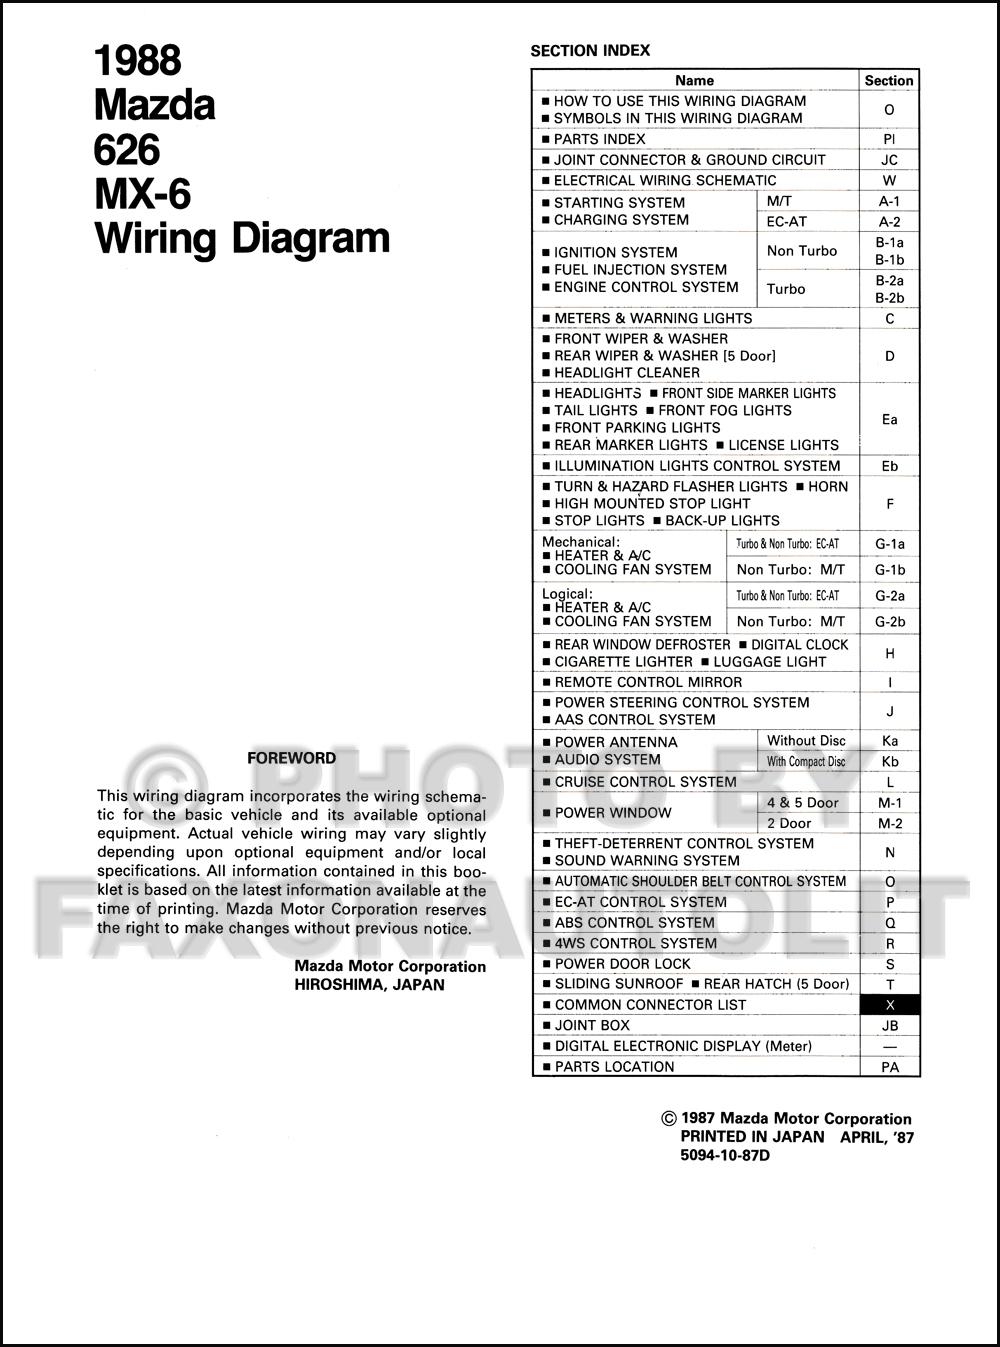 Wiring Diagram For A 1988 Mazda 626 : 35 Wiring Diagram